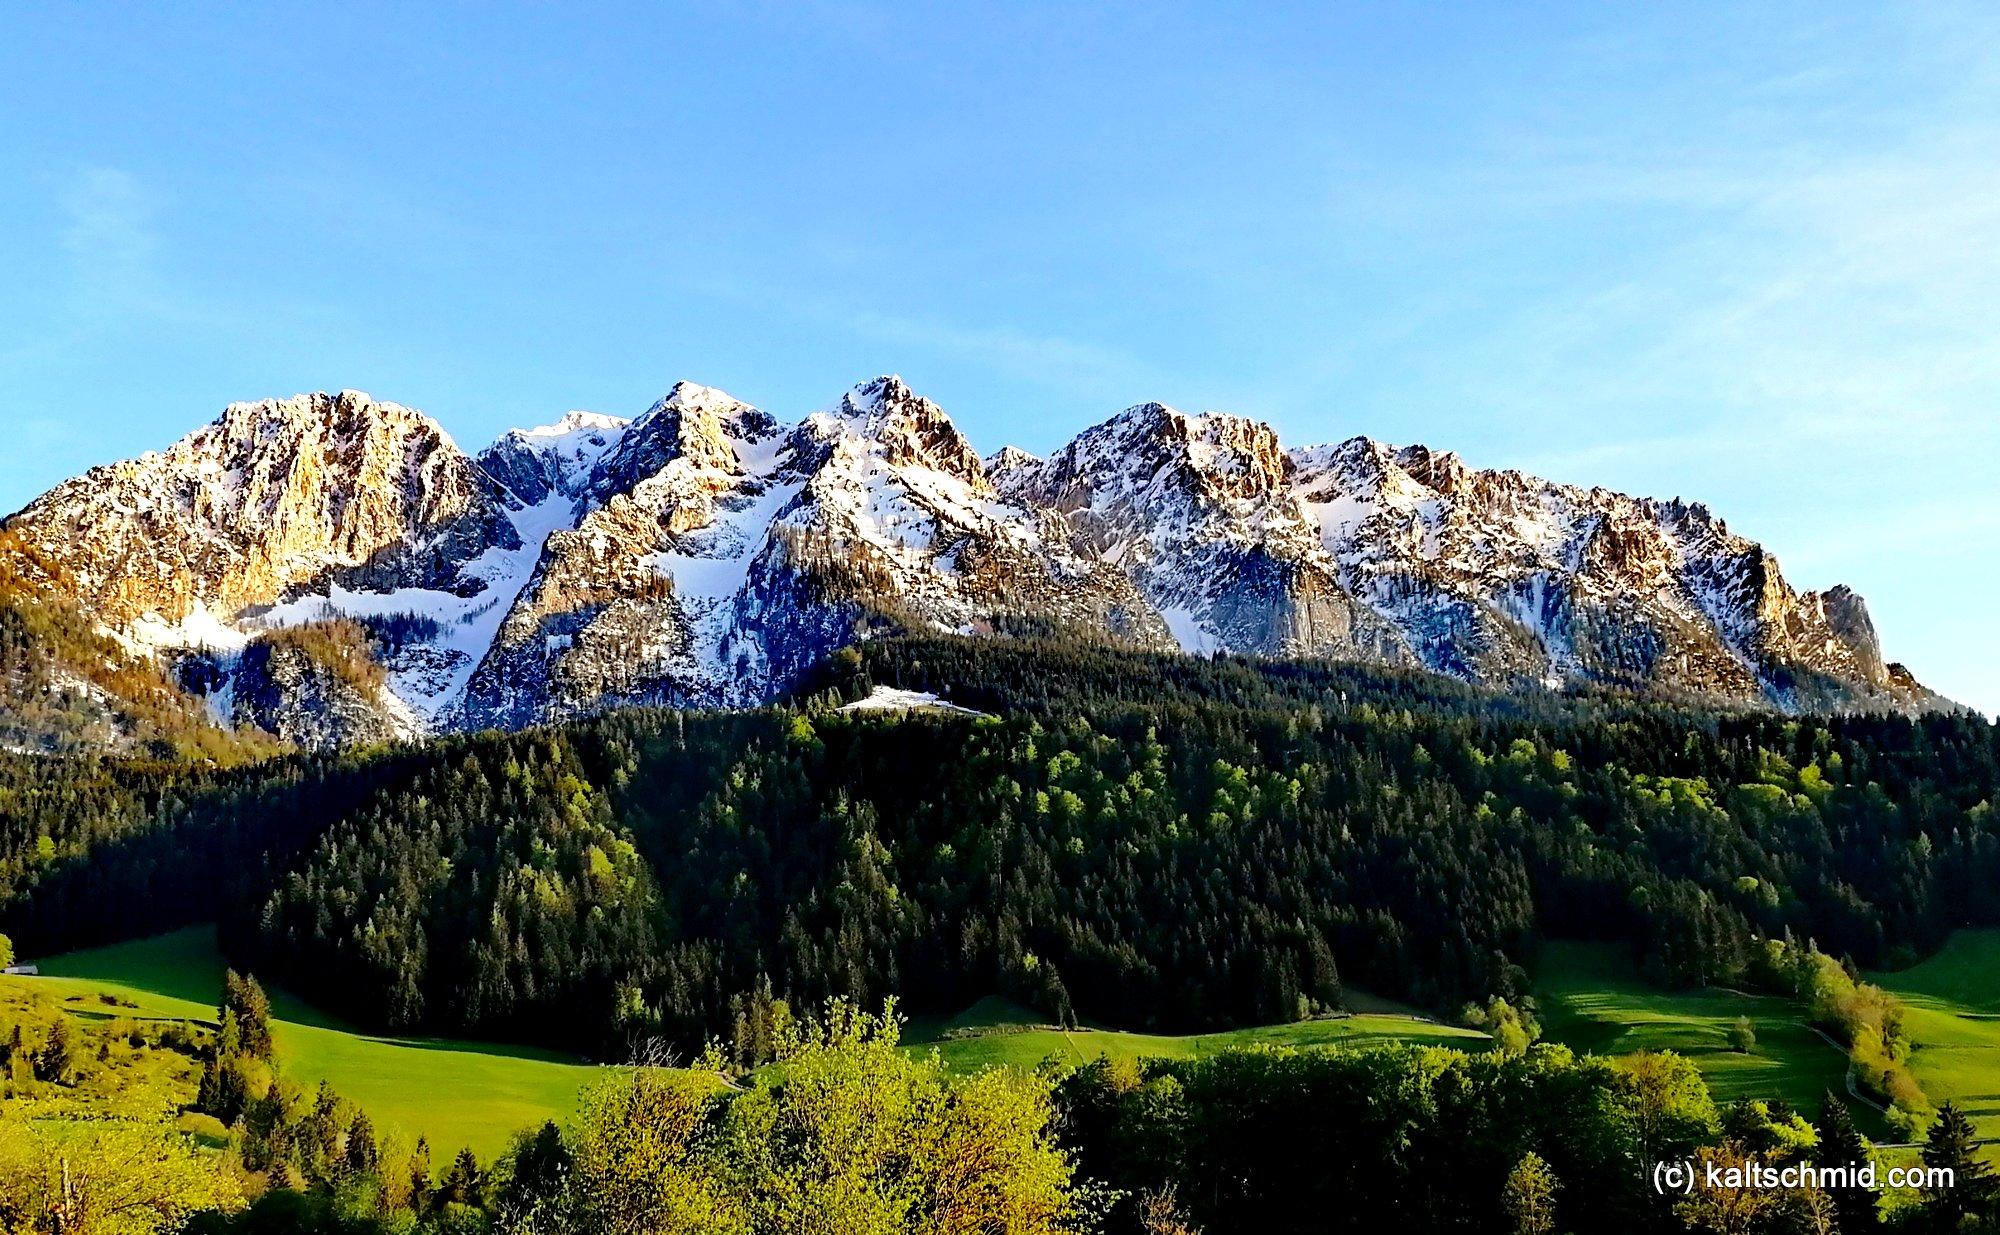 Wandern im Tiroler Kaiserwinkliser-niederndorferberg (23)